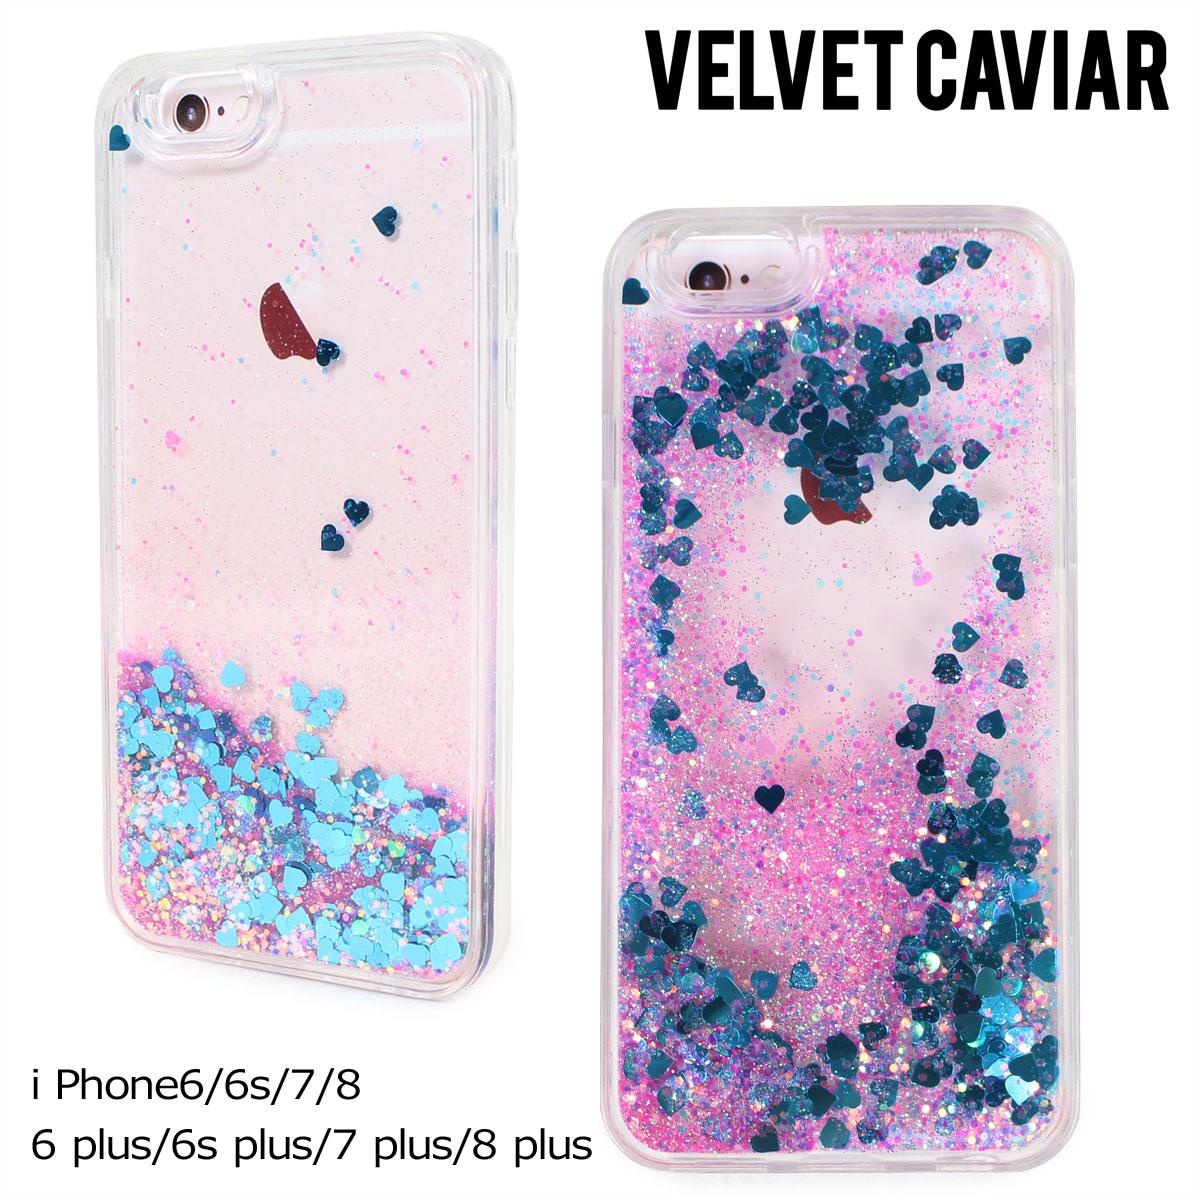 newest 98091 d36f3 Velvet Caviar HEARTS GLITTER IPHONE CASE velvet caviar iPhone8 iPhone7 8  Plus 7Plus 6s six cases smartphone iPhone case eyephone iPhone velvet  Lady's ...